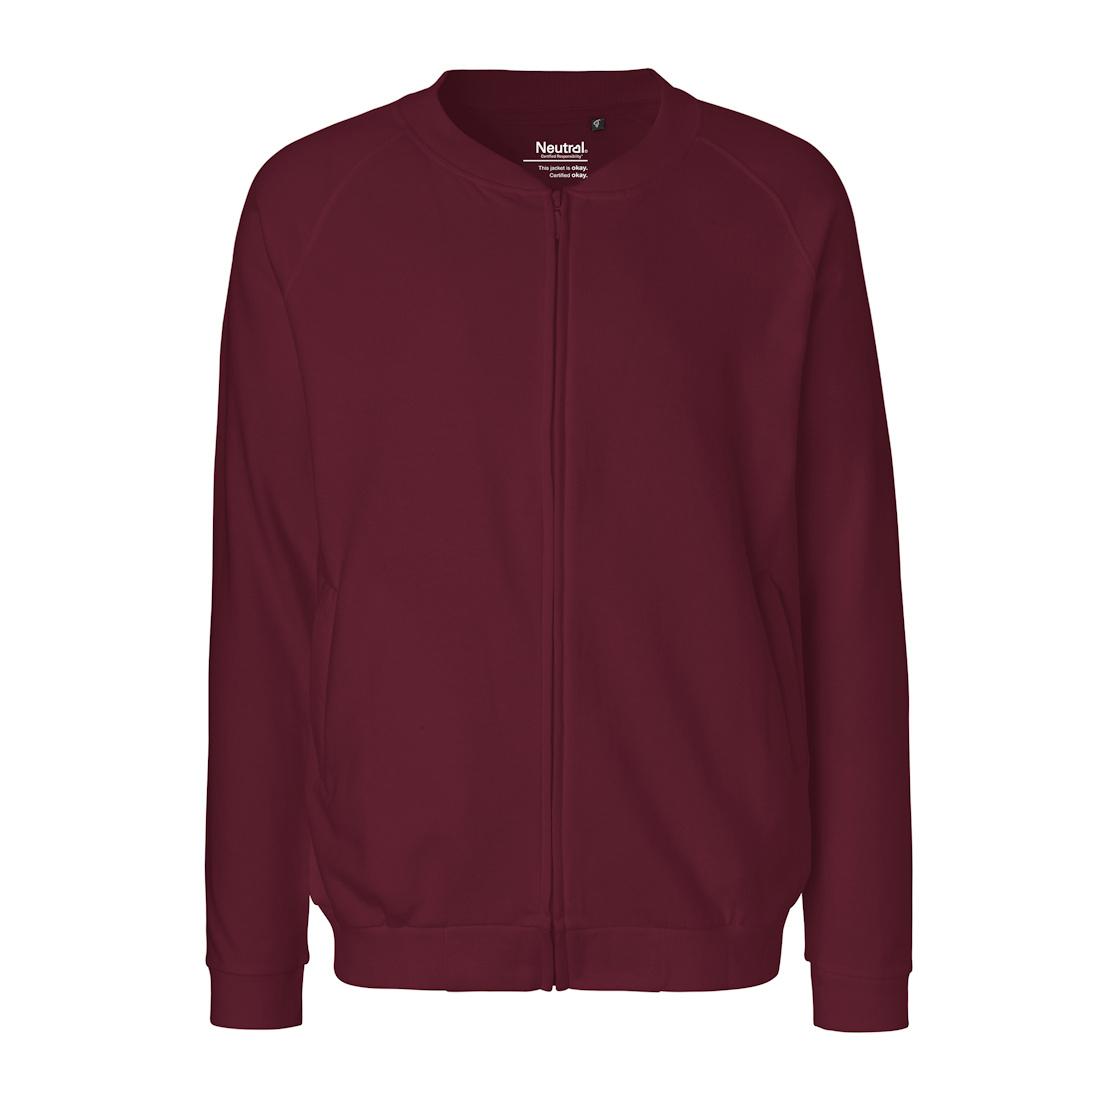 Neutral Organic Jacket O73501 1